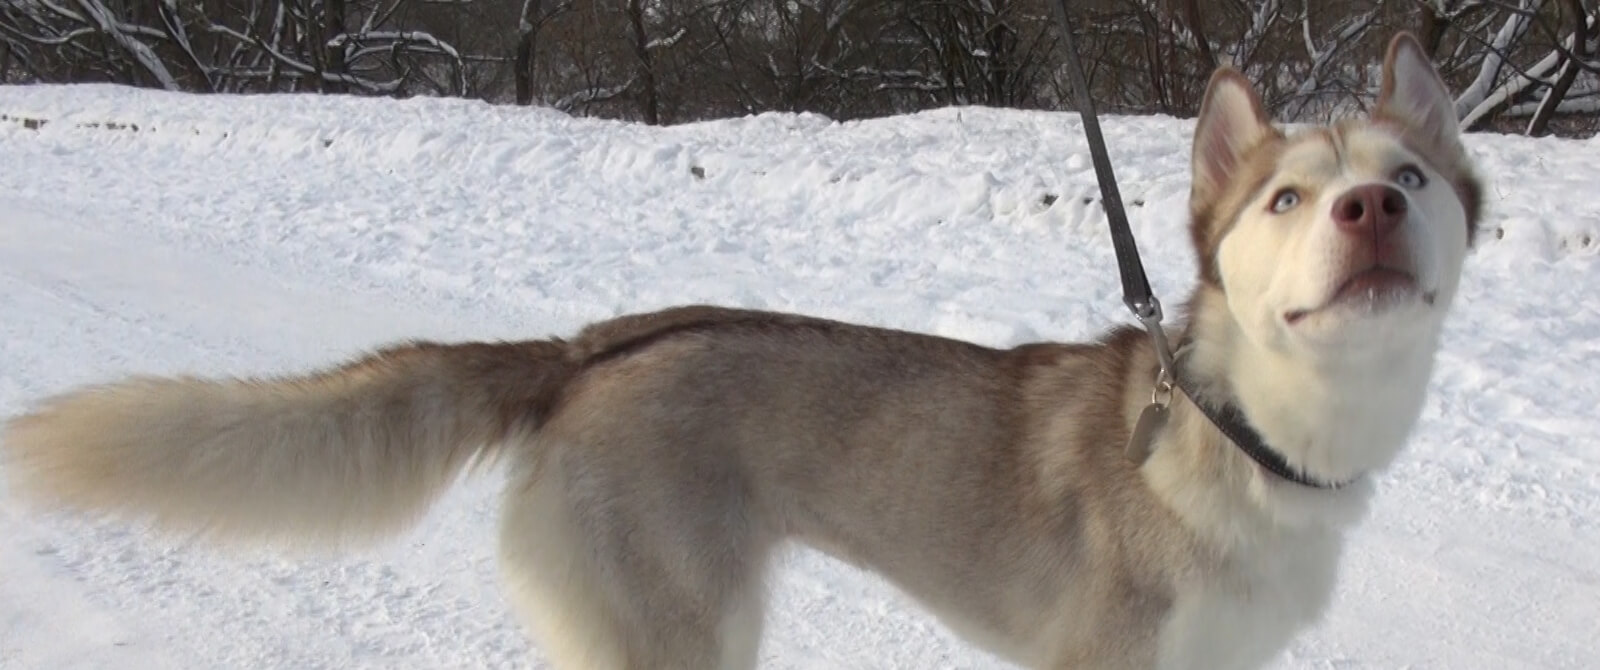 Šuo vardu Kiora